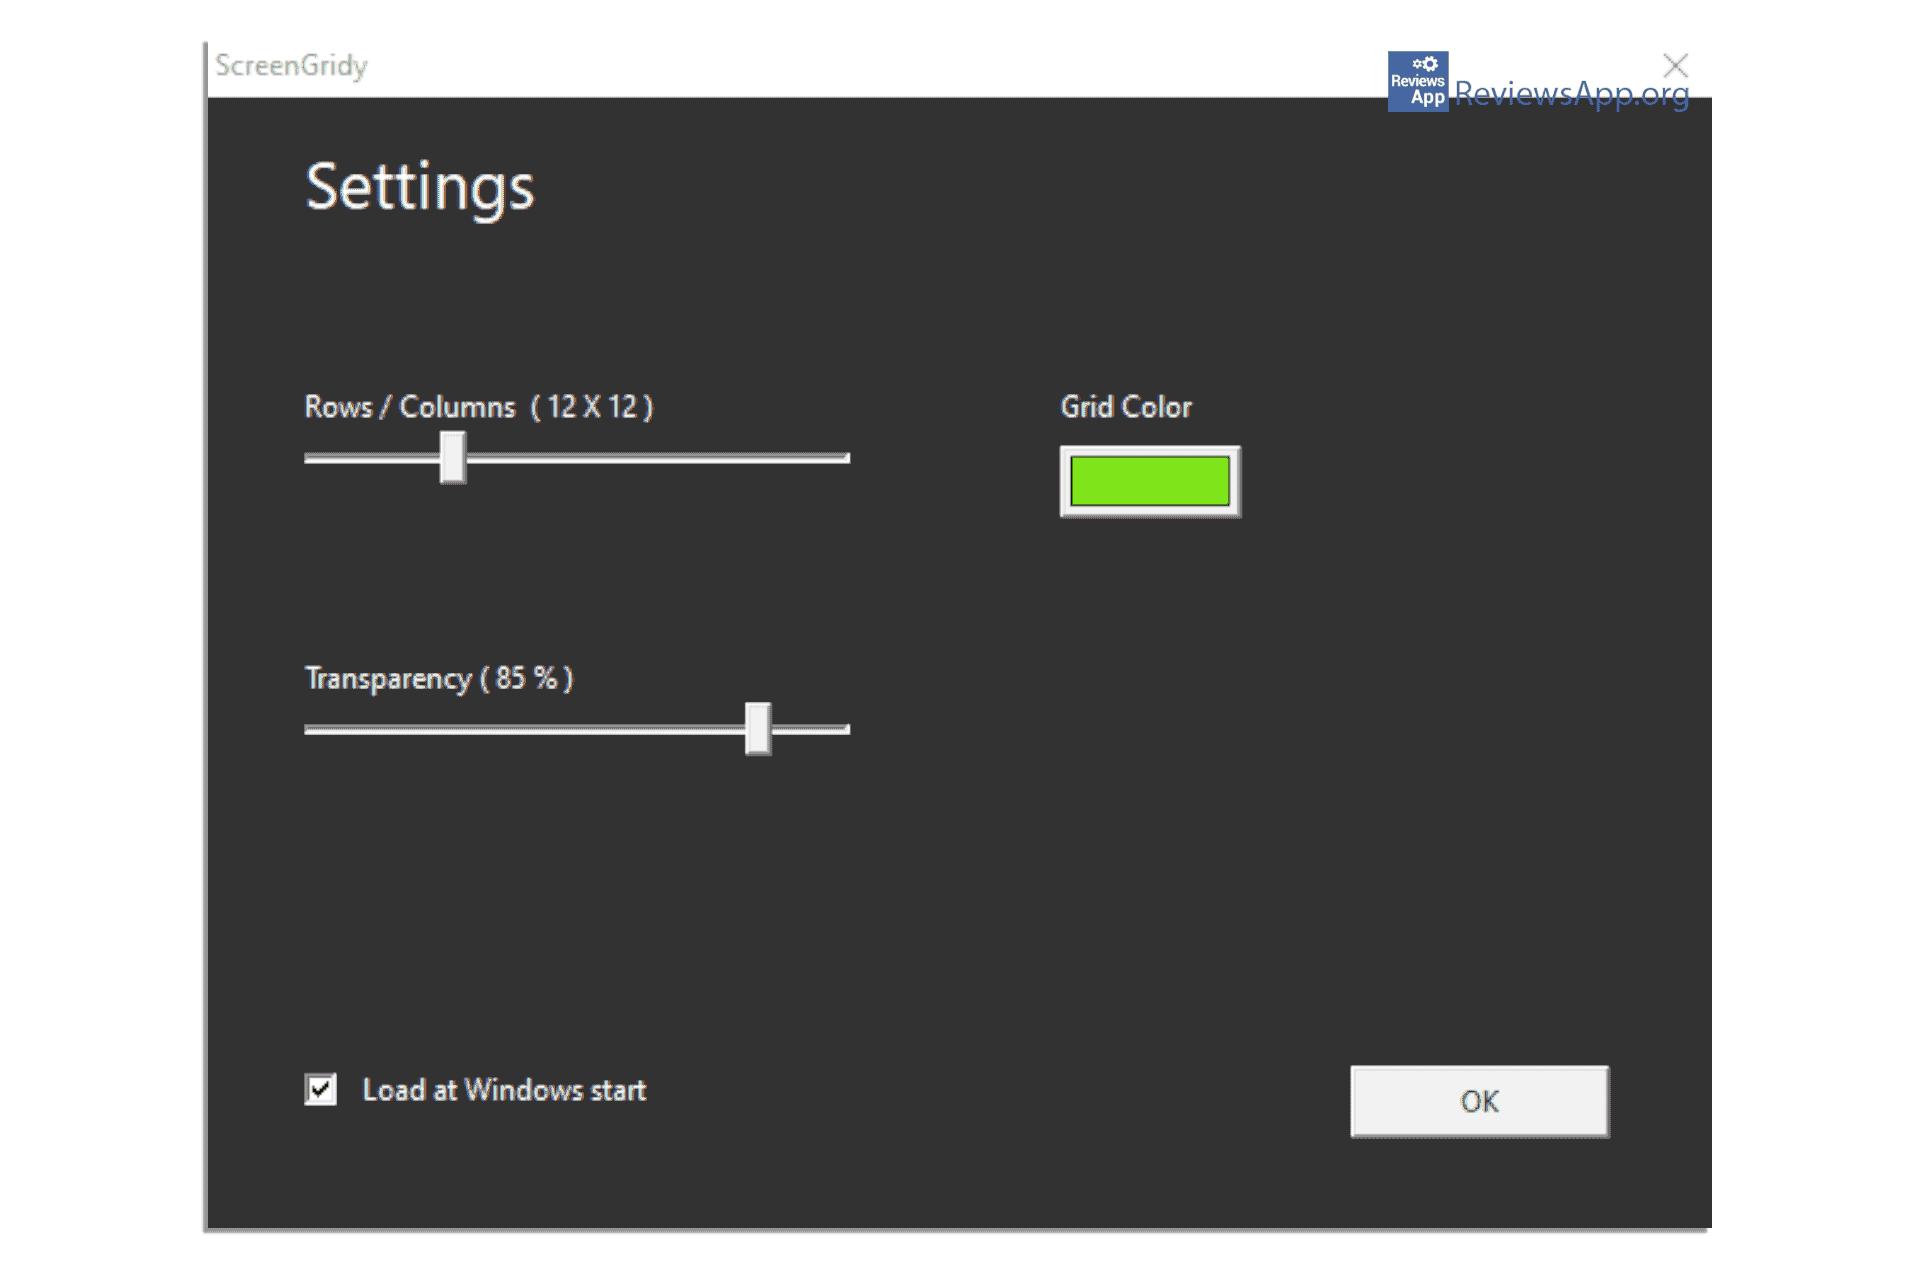 ScreenGridy settings